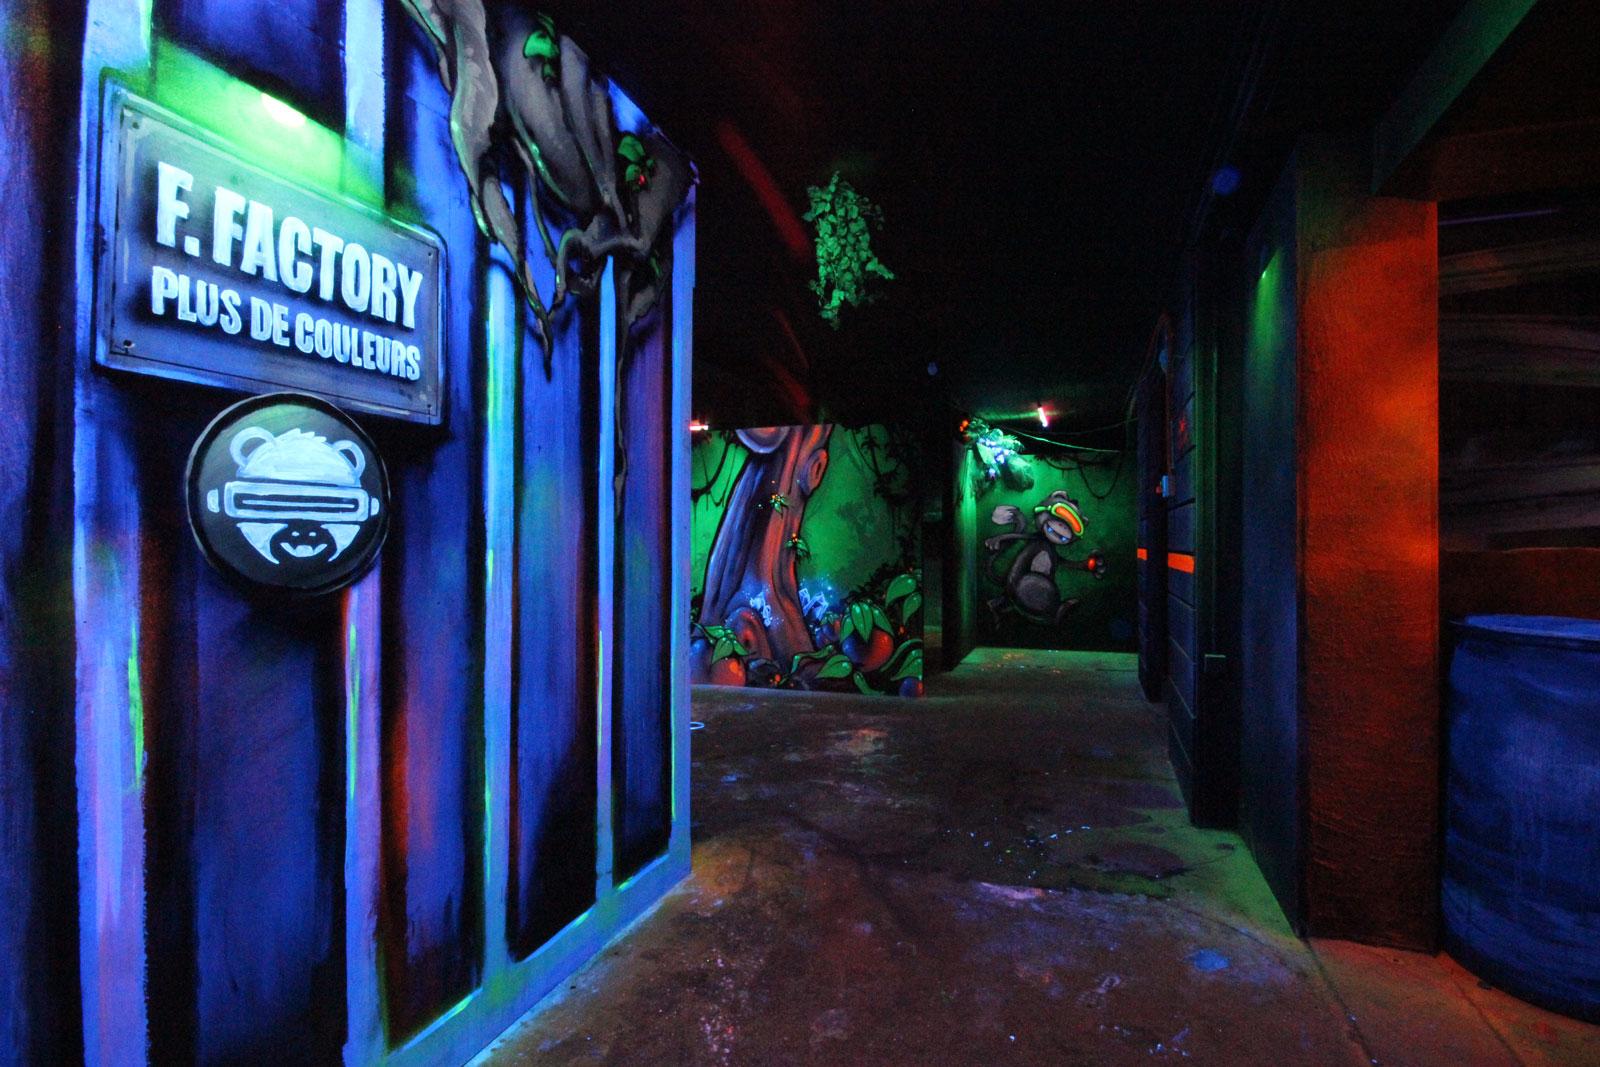 La salle de Laser Game de la Funky Factory - image 8